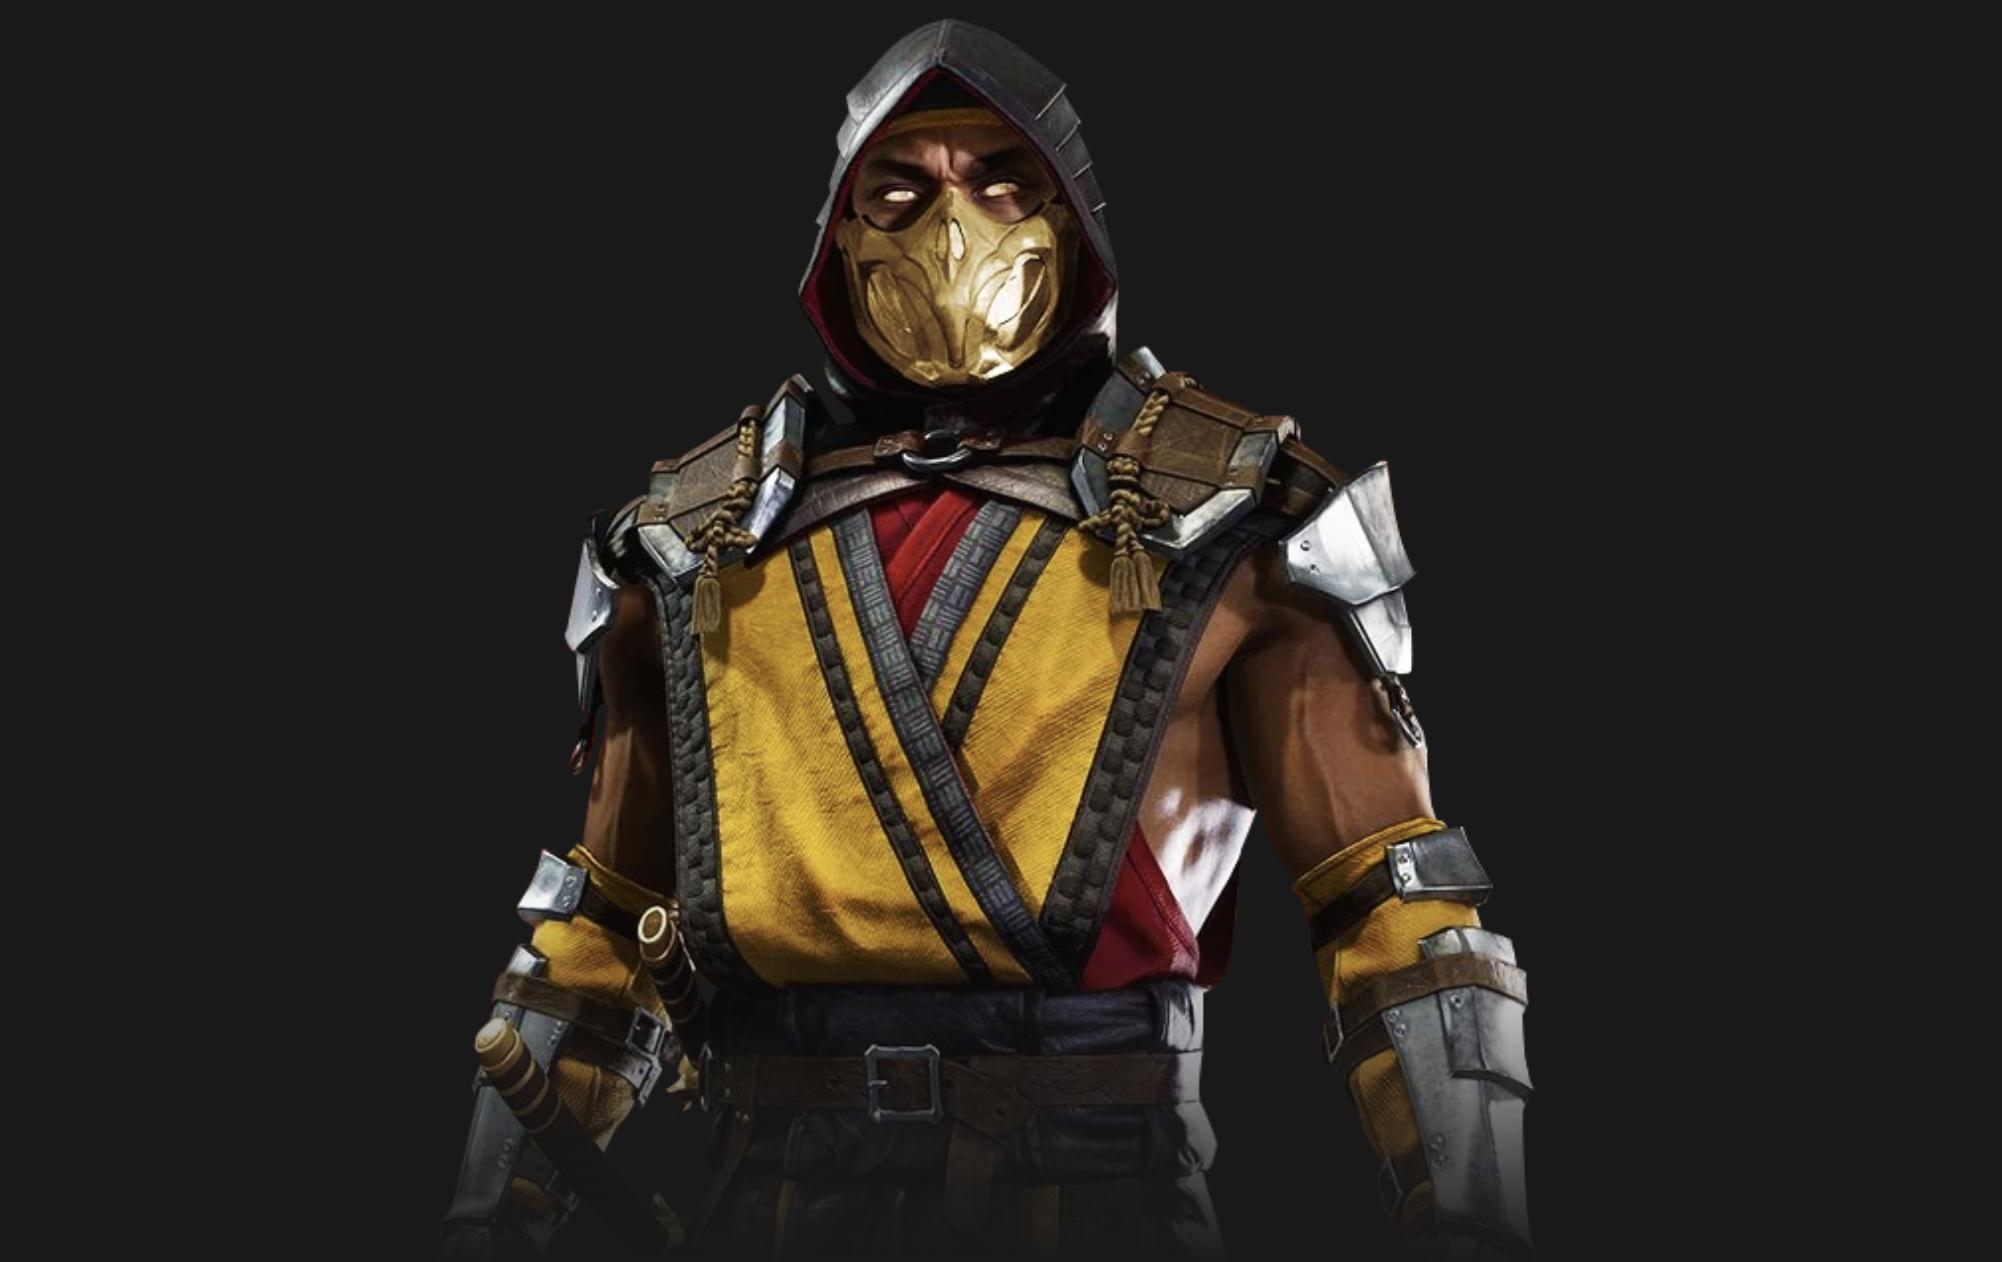 Mortal Kombat ตัวละคร 5-Scorpion ตัวที่คู่ควรเอามาเล่น